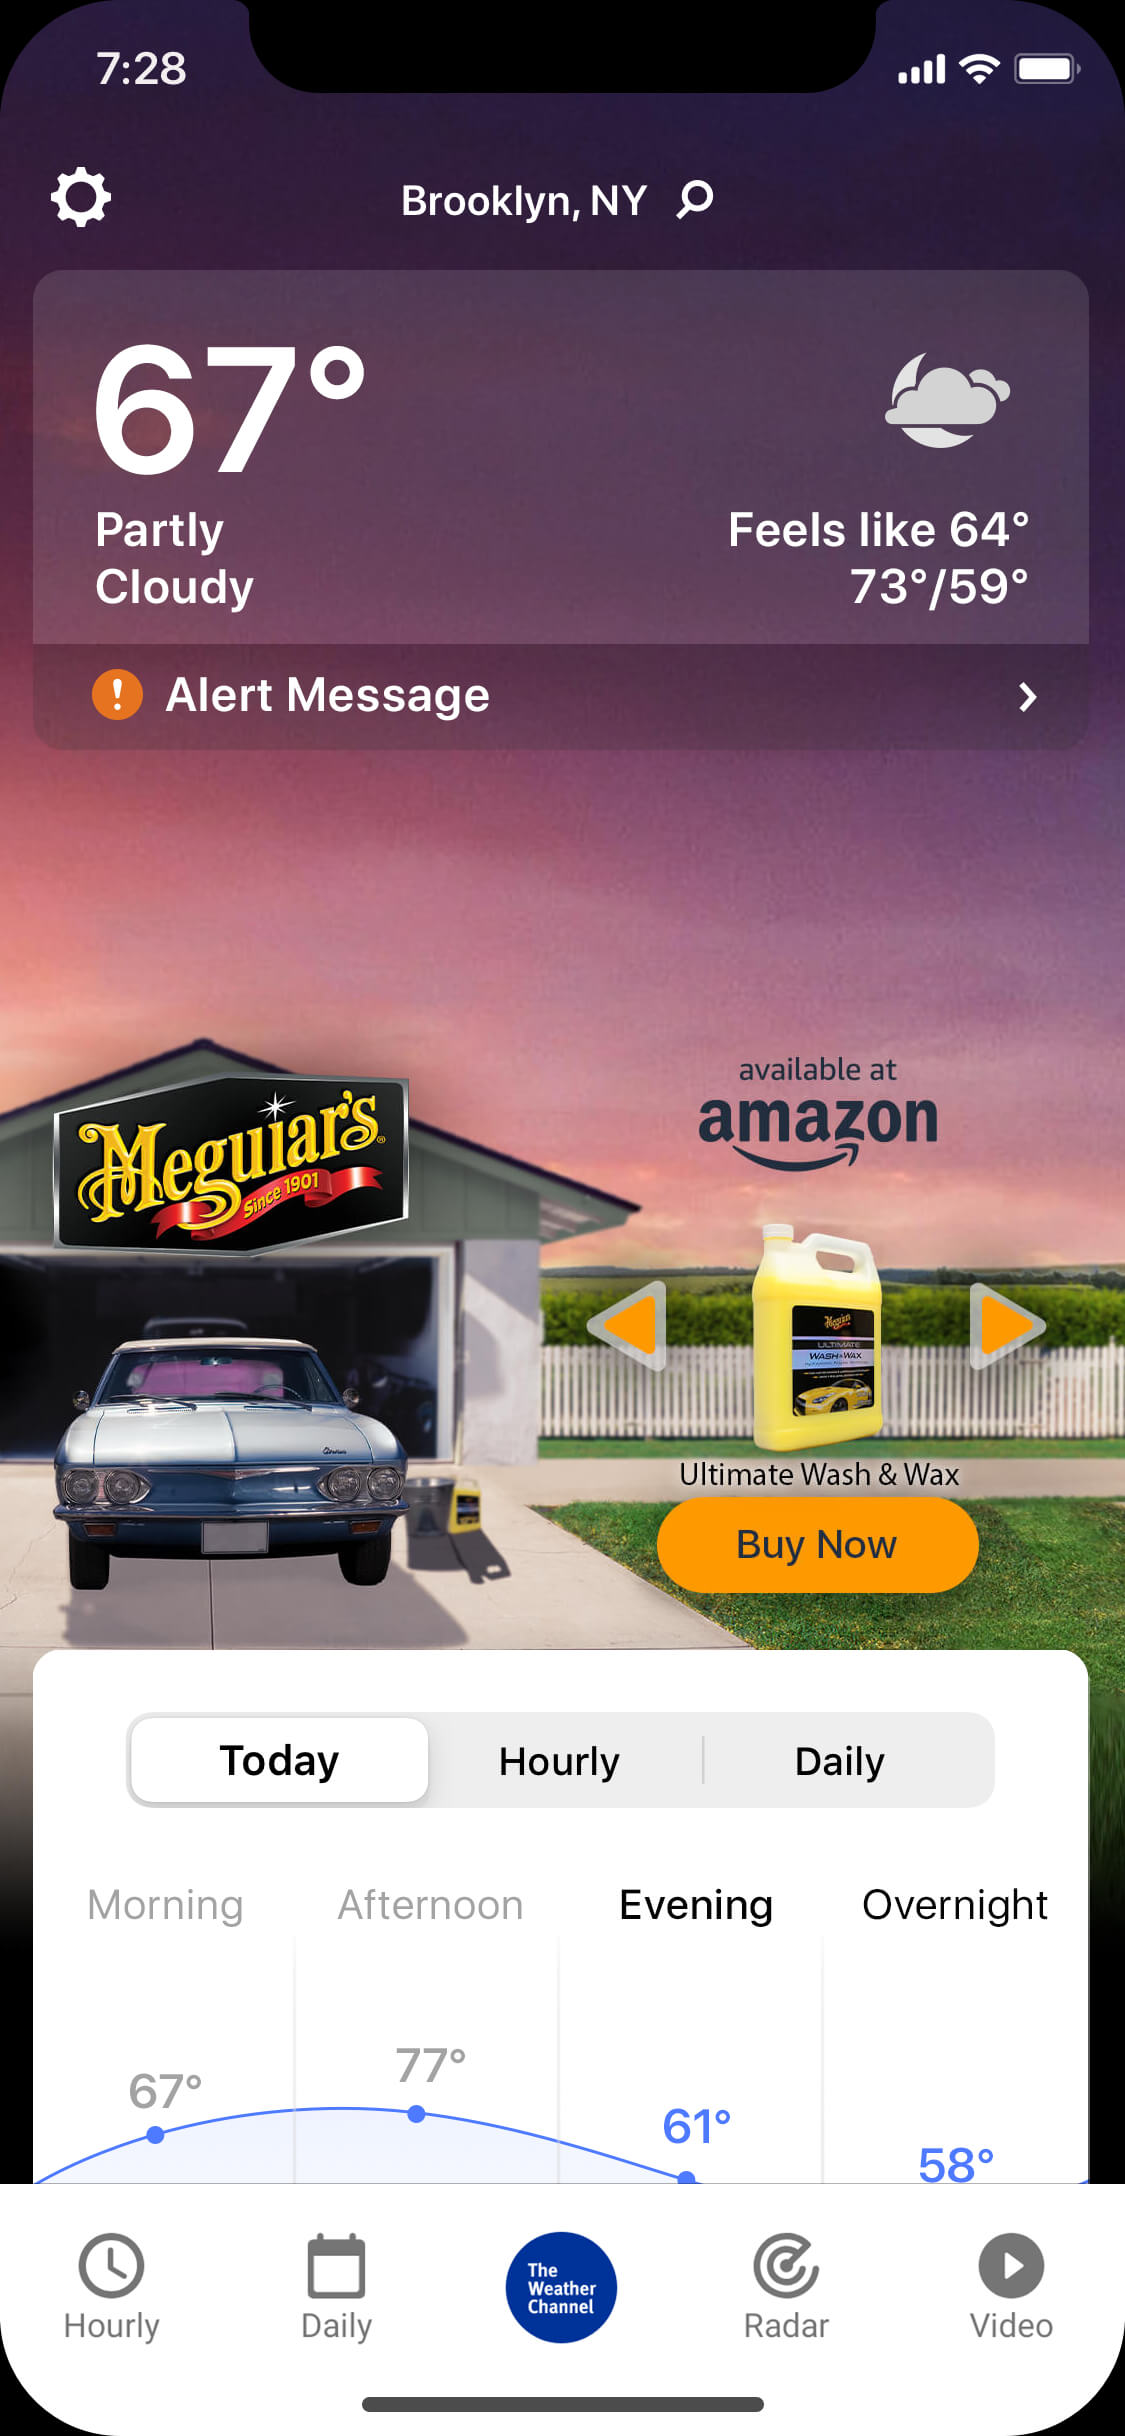 Amazon-Meguiar's-MAIM-Carousel_cloudy_night